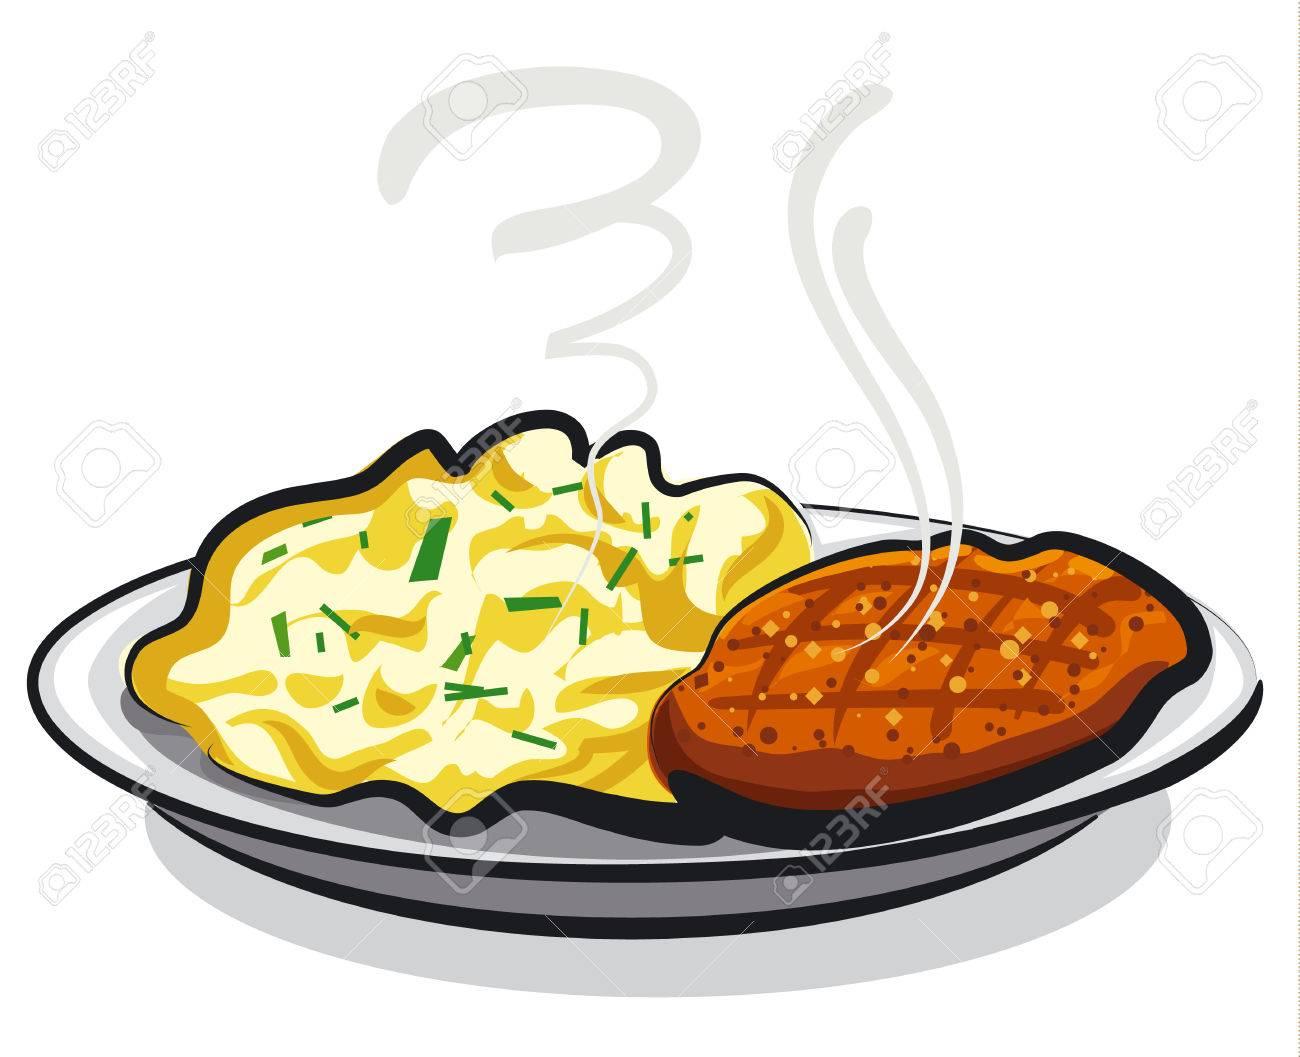 Mashed Potato Clipart.